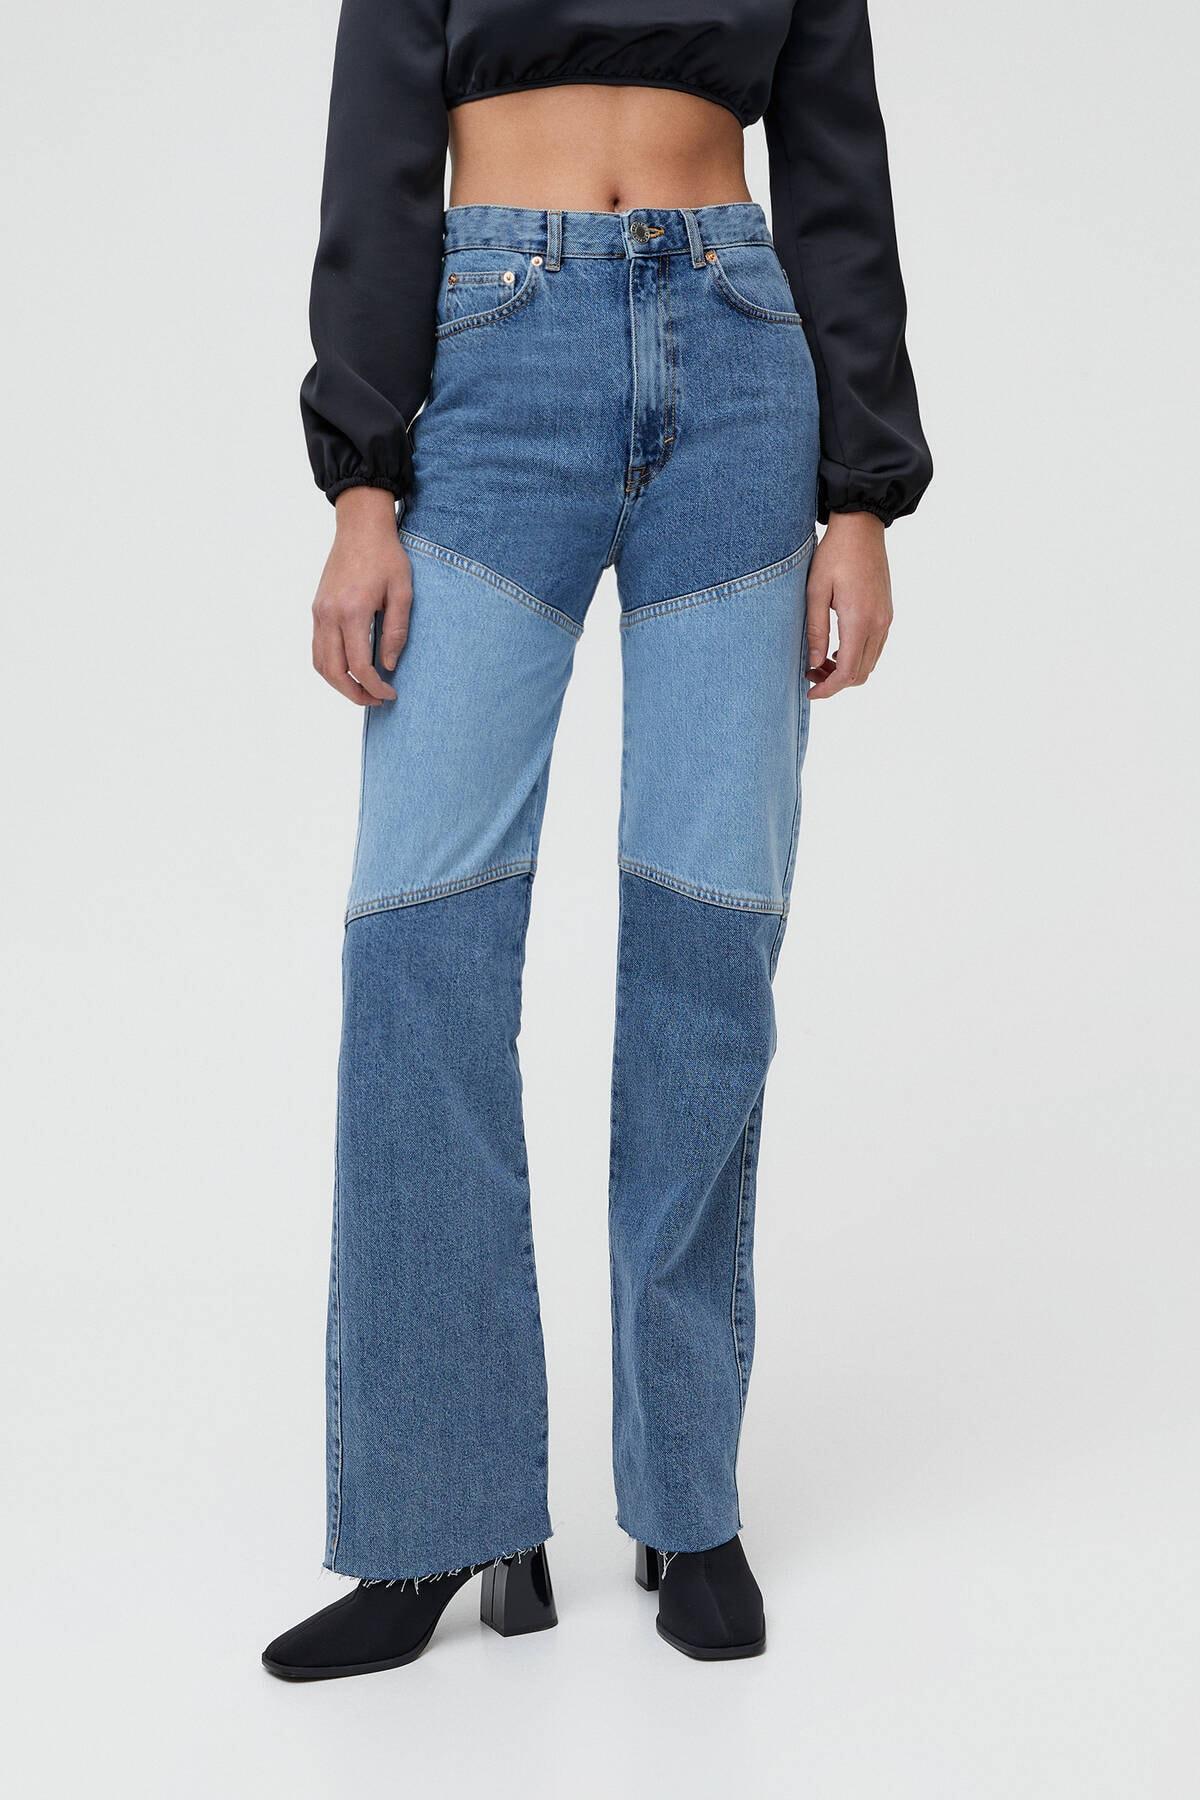 Pull & Bear Kontrast Parçalı Yüksek Bel Straight Fit Jean 2